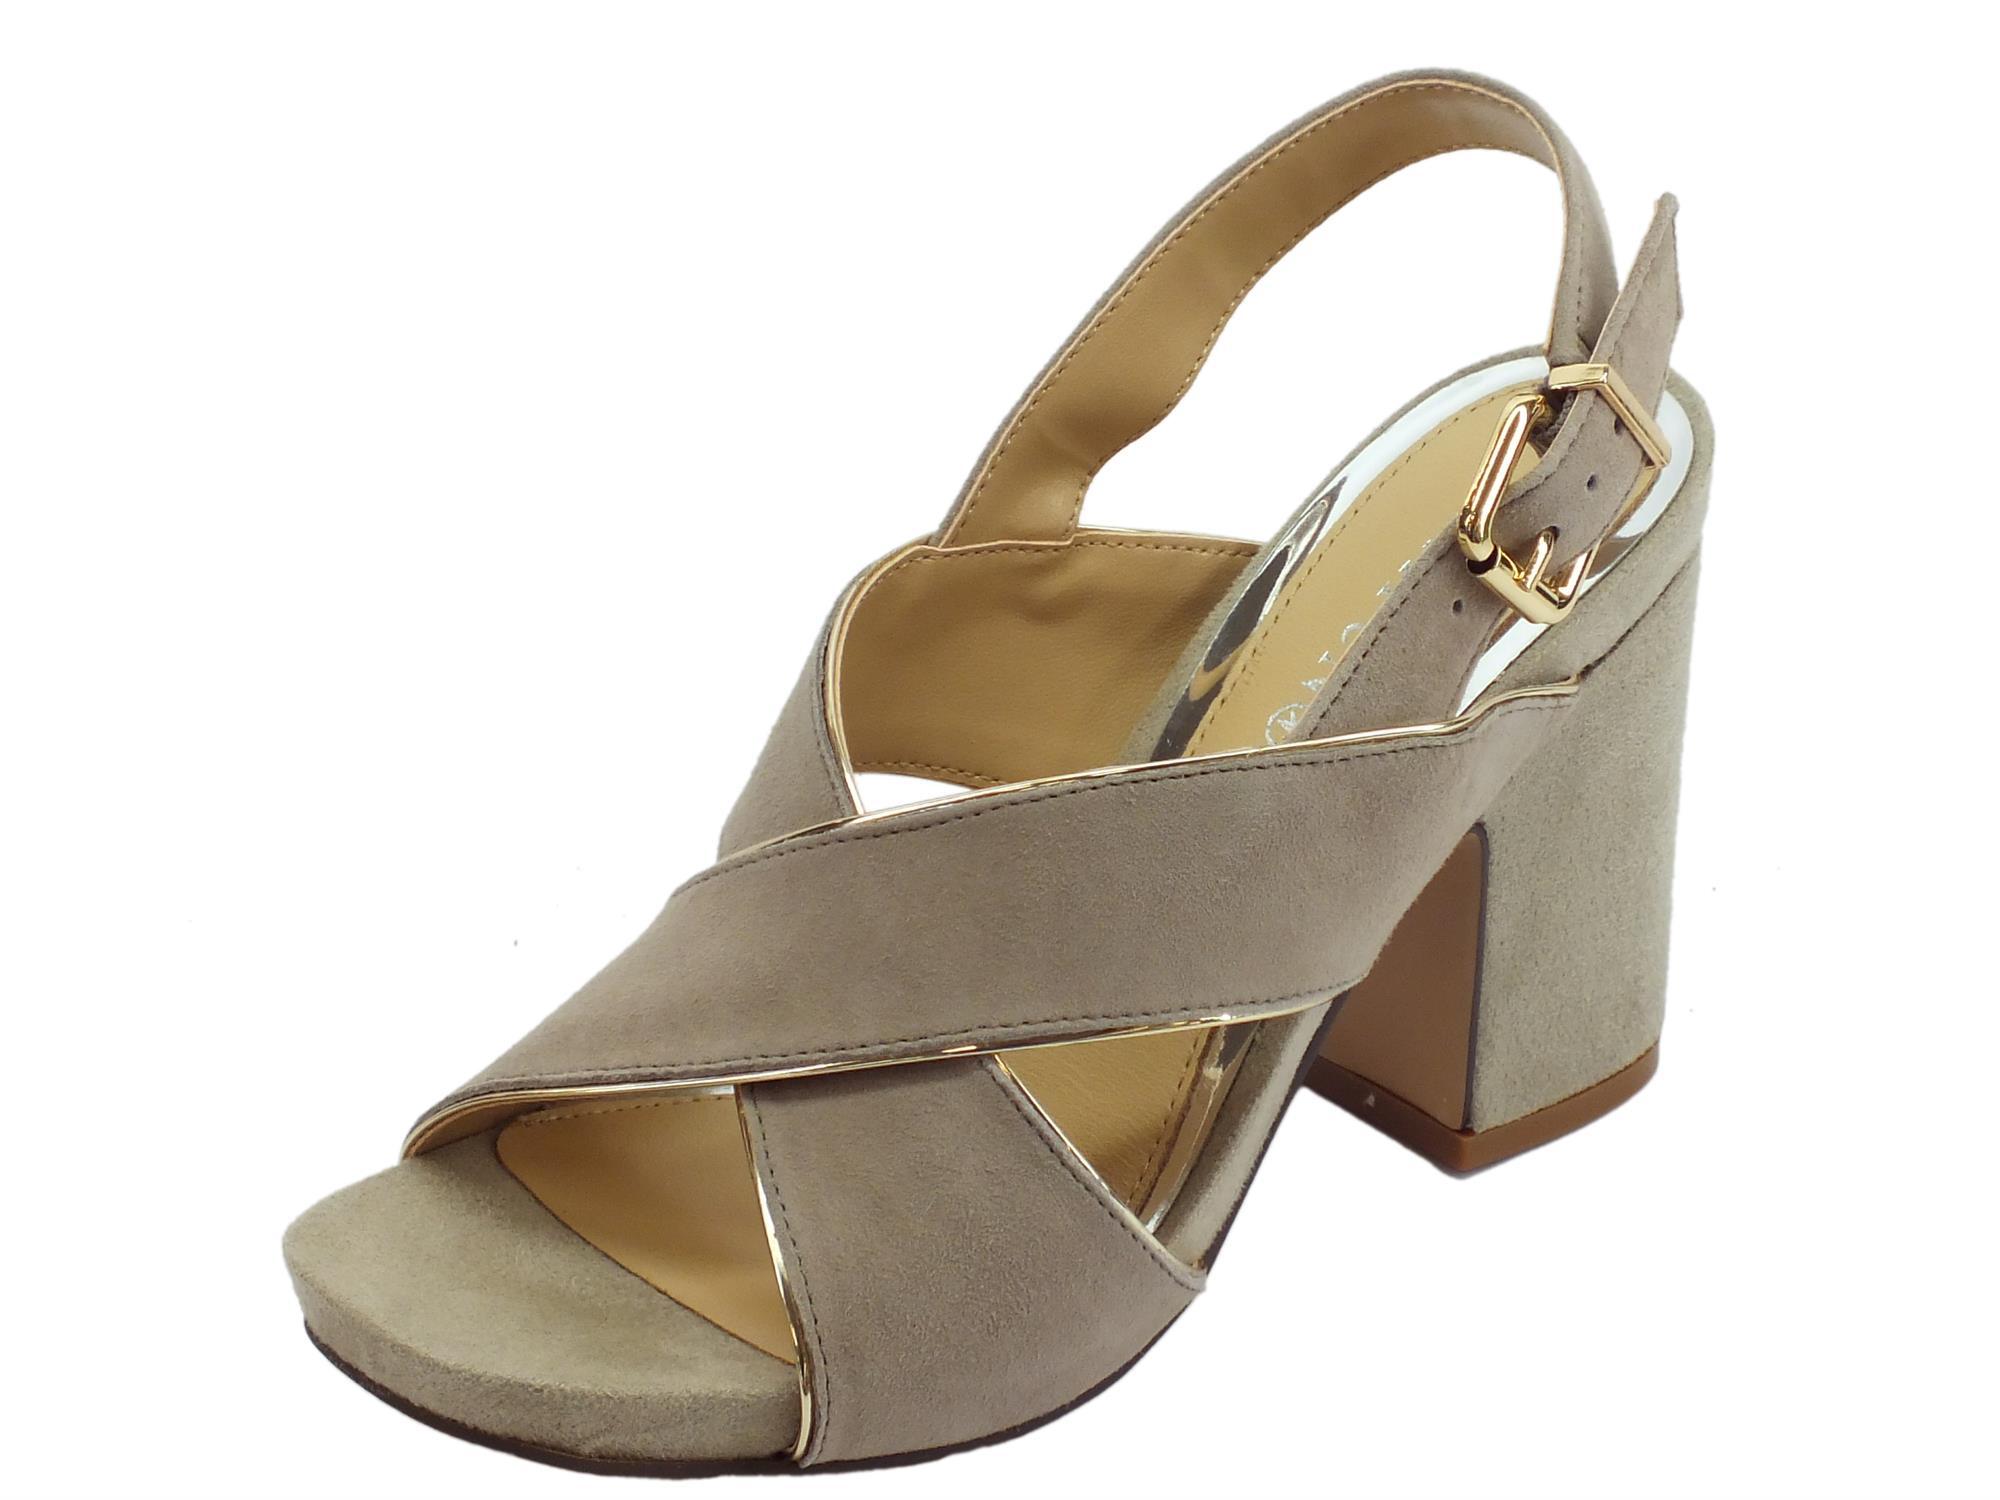 4730e87aa9d4f5 CafèNOIR sandali donna in camoscio incrociato taupe con filo argento e  tacco alto